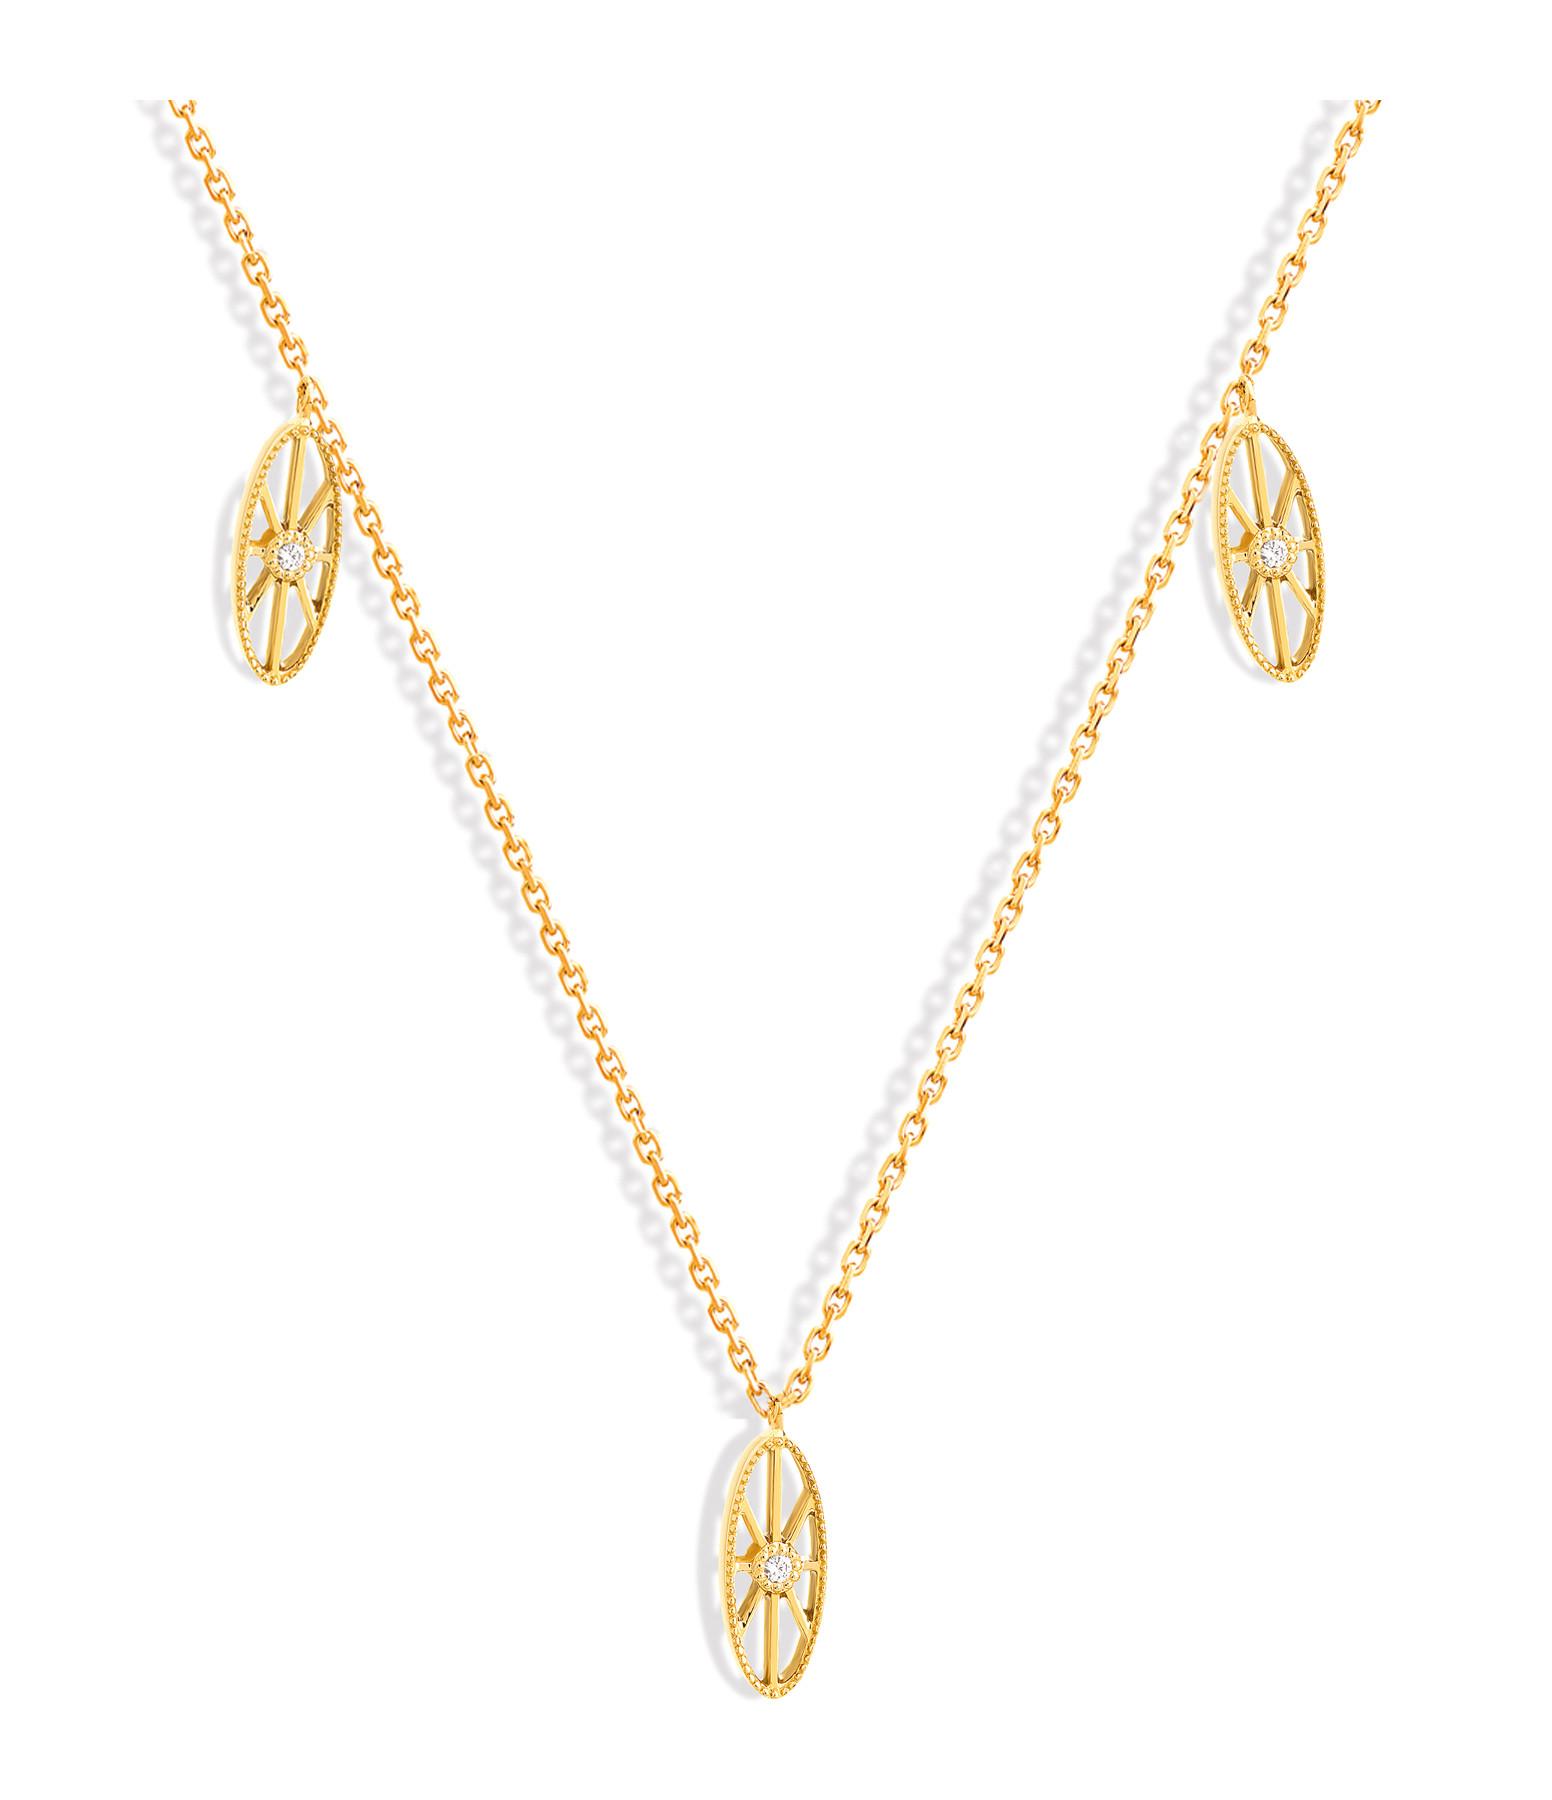 NAVA JOAILLERIE - Collier Cheyenne Mini-Ovale Diamants Or Jaune